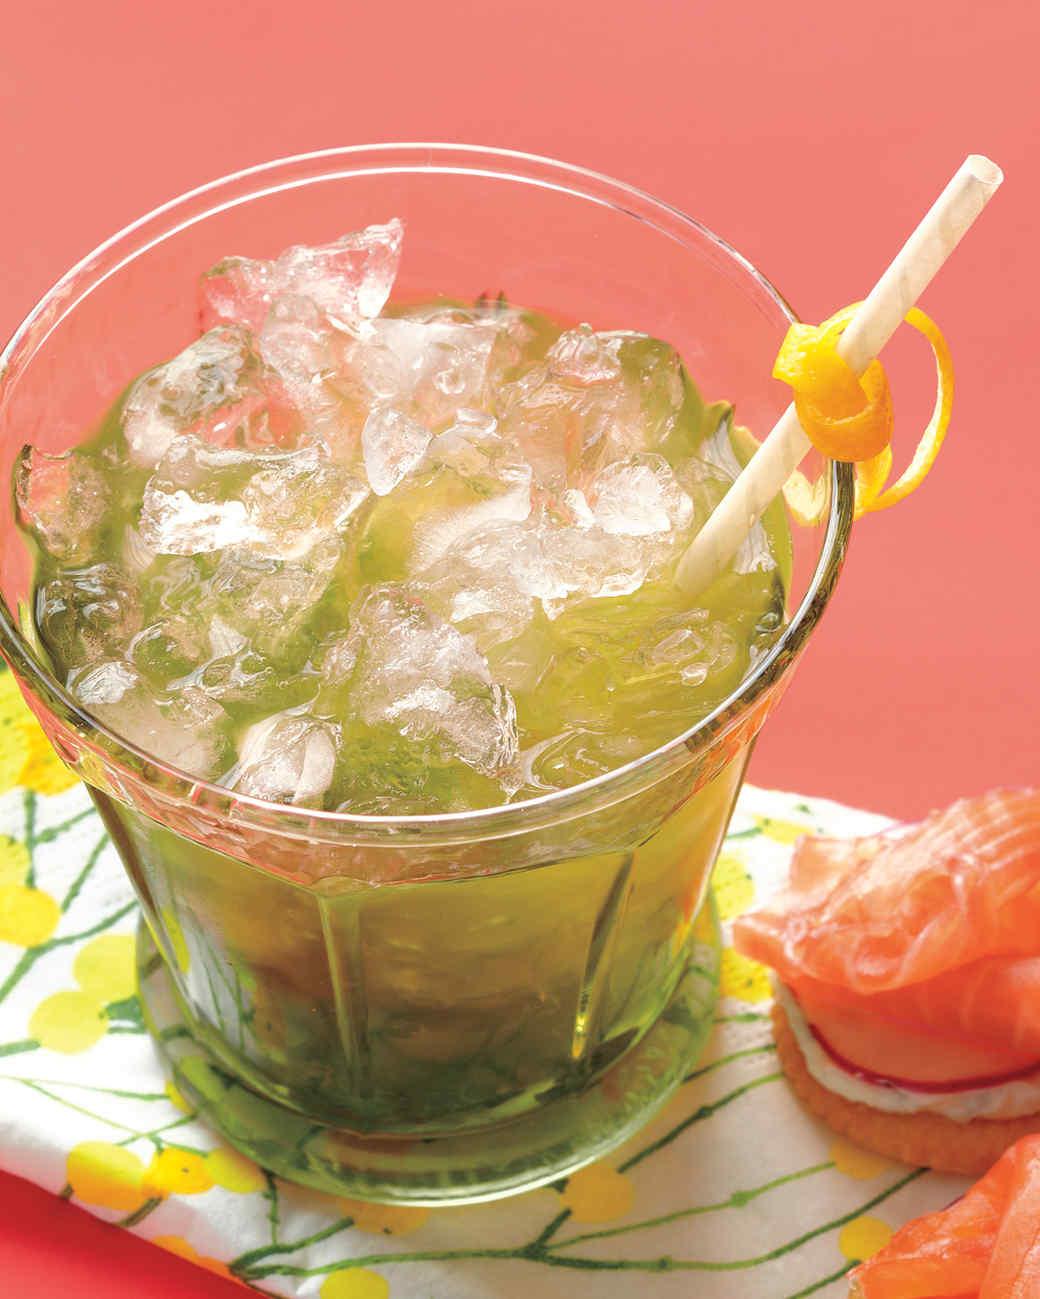 Lemon-and-Mint Julep